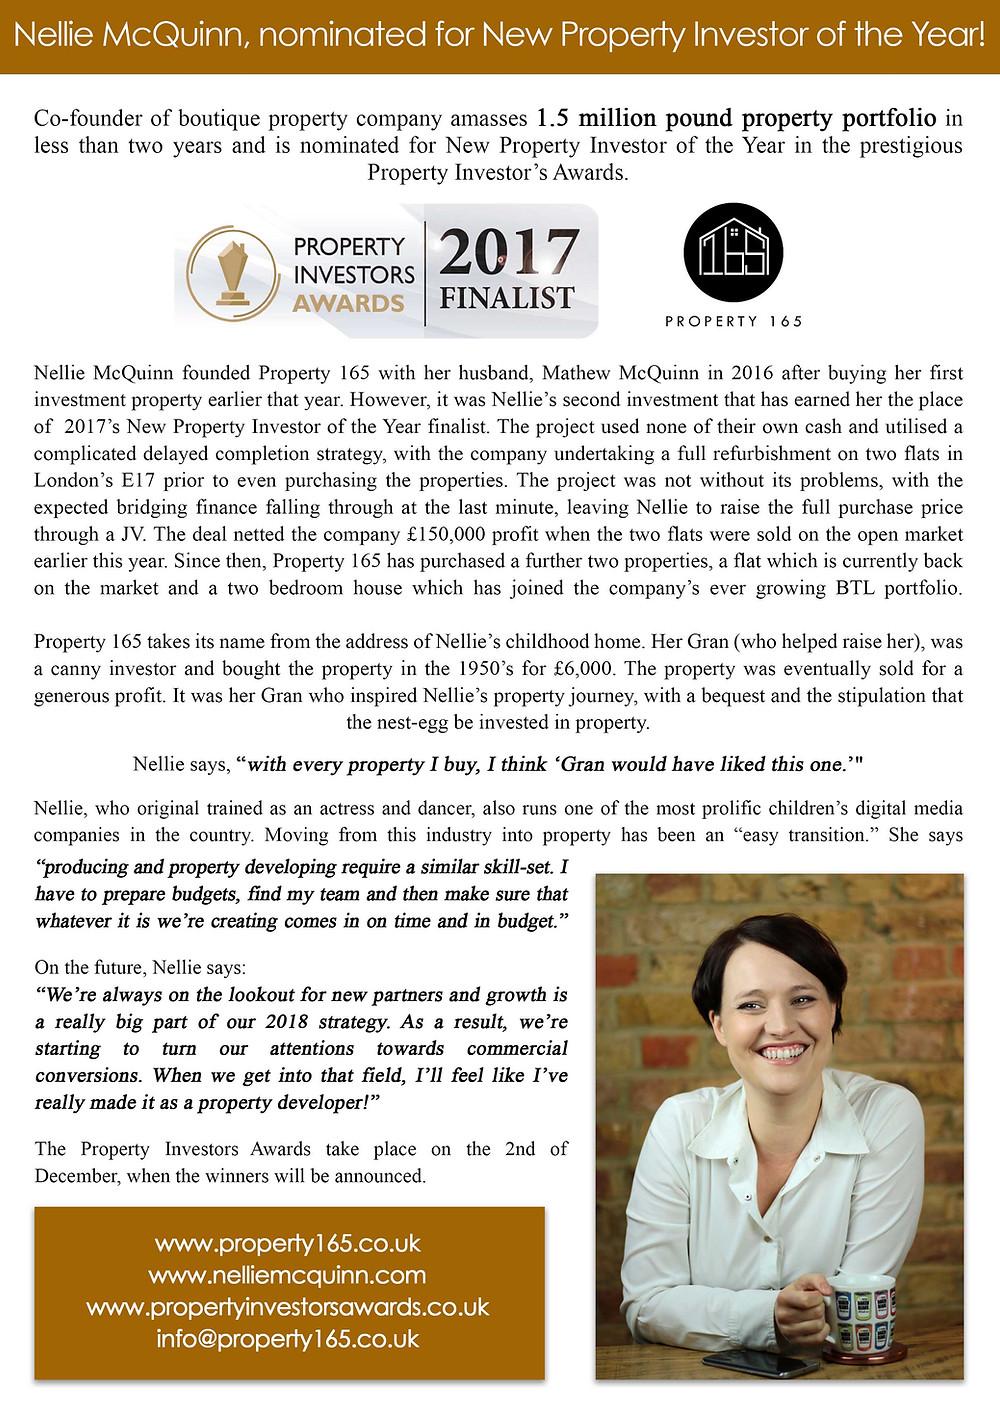 Nellie McQuinn, Property Investors Awards Press Release